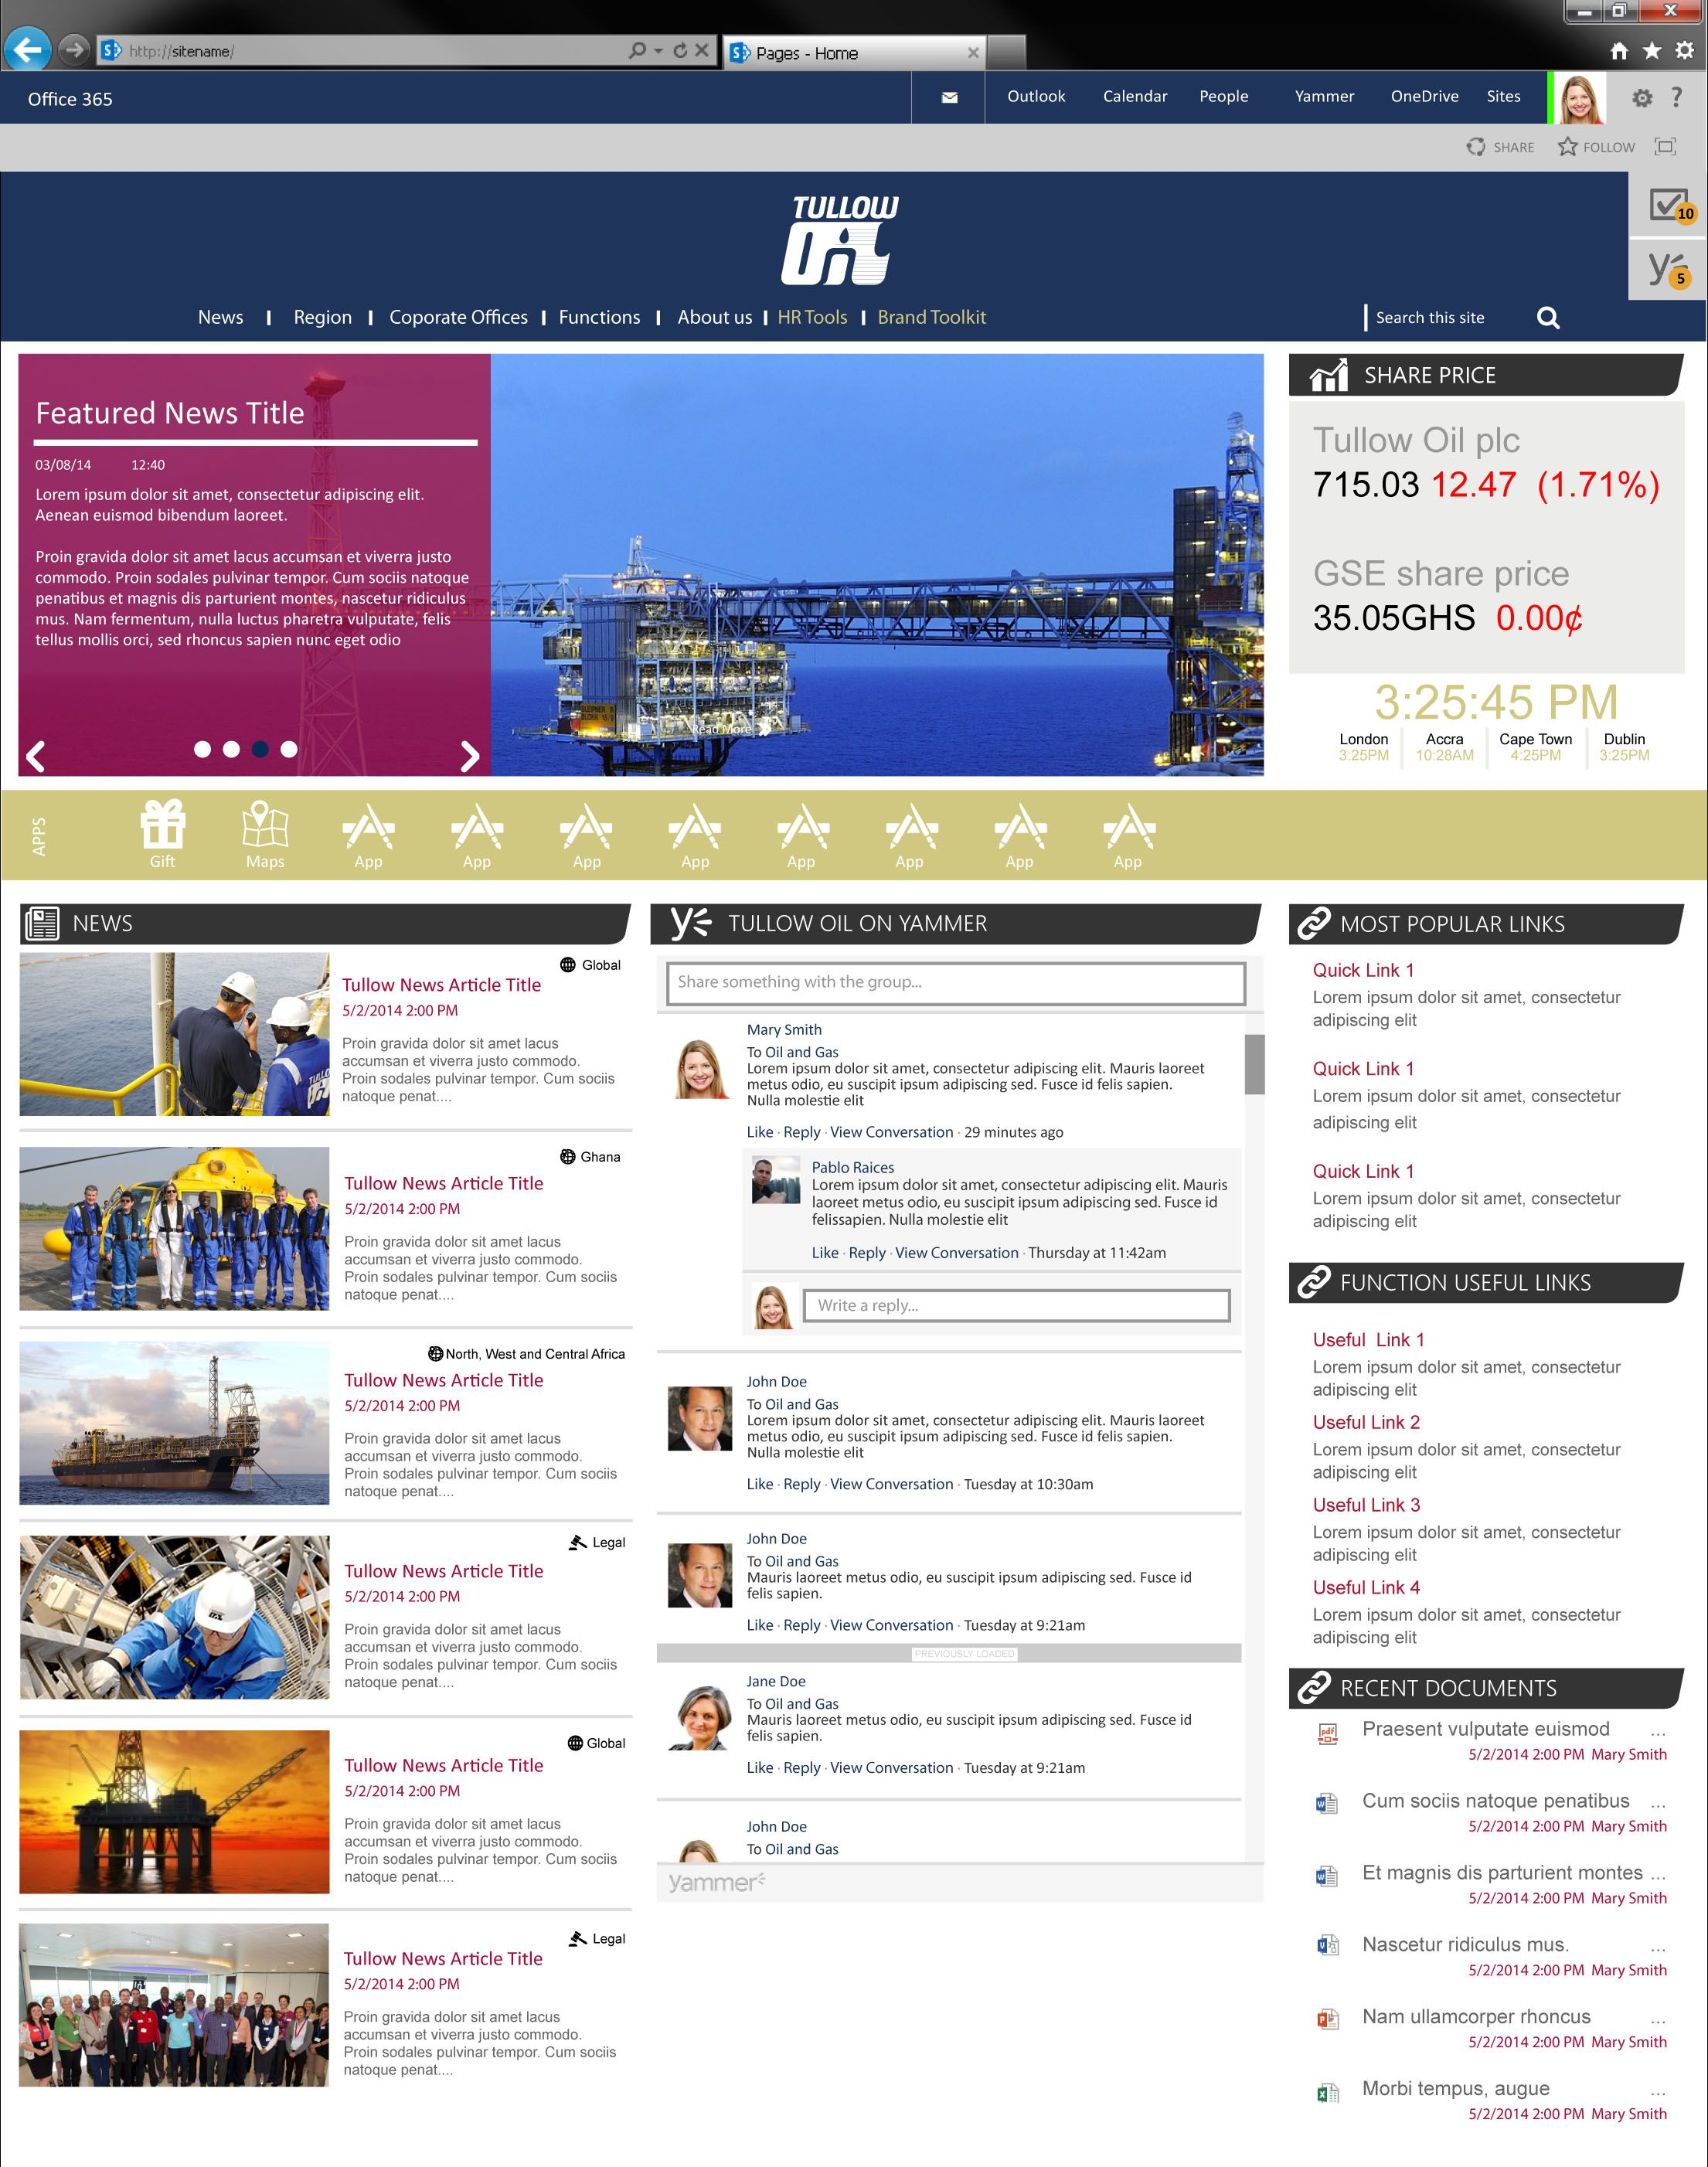 Kintivo customer launches beautiful new sharepoint 2013 public kintivo customer launches beautiful new sharepoint 2013 public website sharepoint pinterest spotlight and office 365 baditri Choice Image